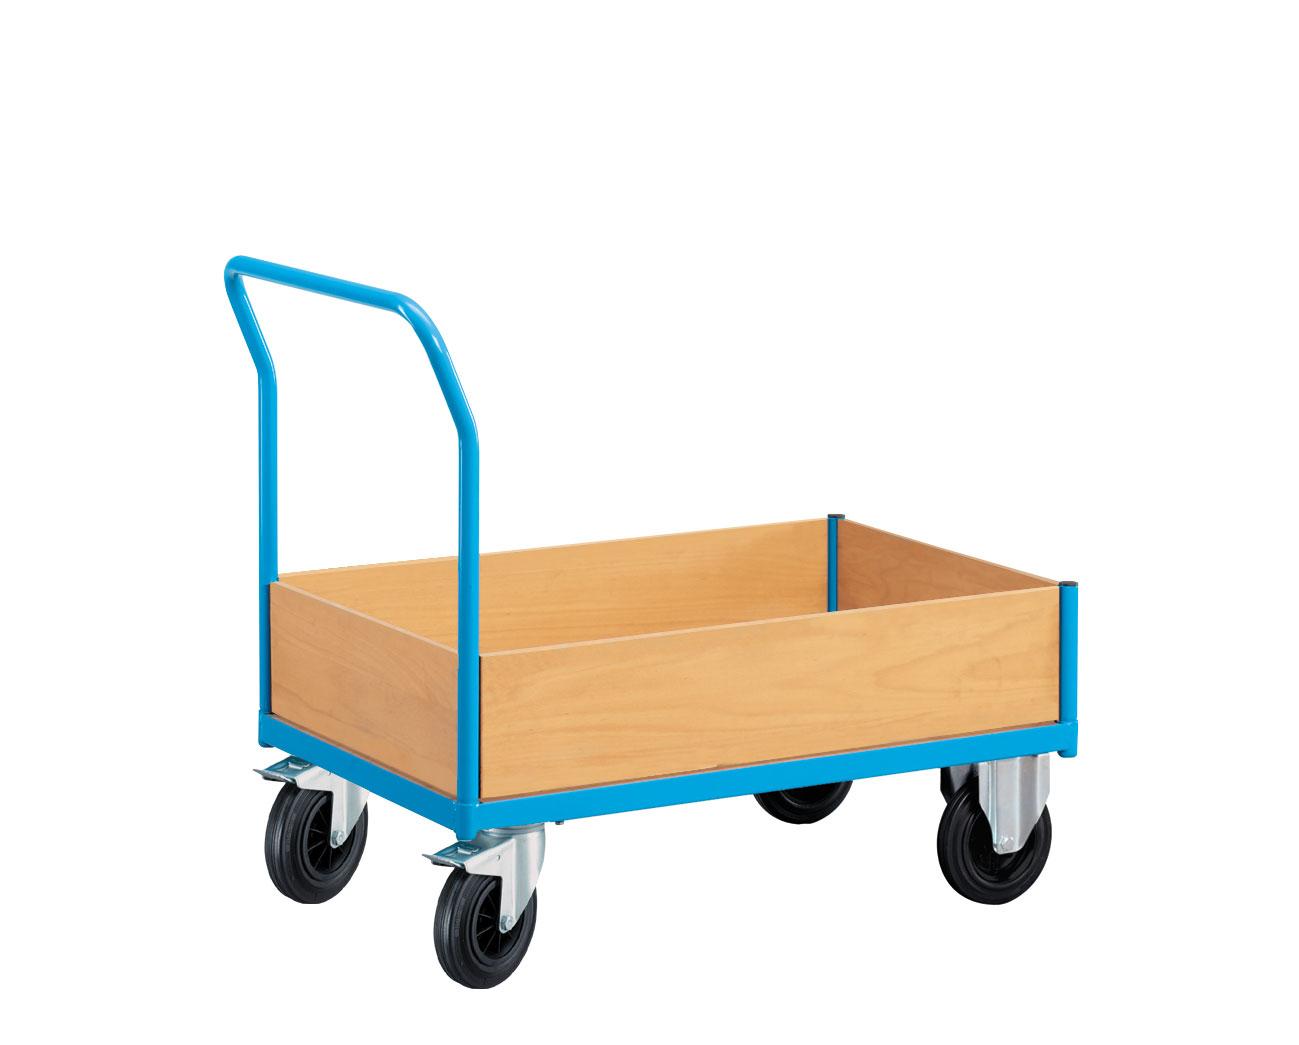 Chariot manutention avec 4 rebords bas en bois